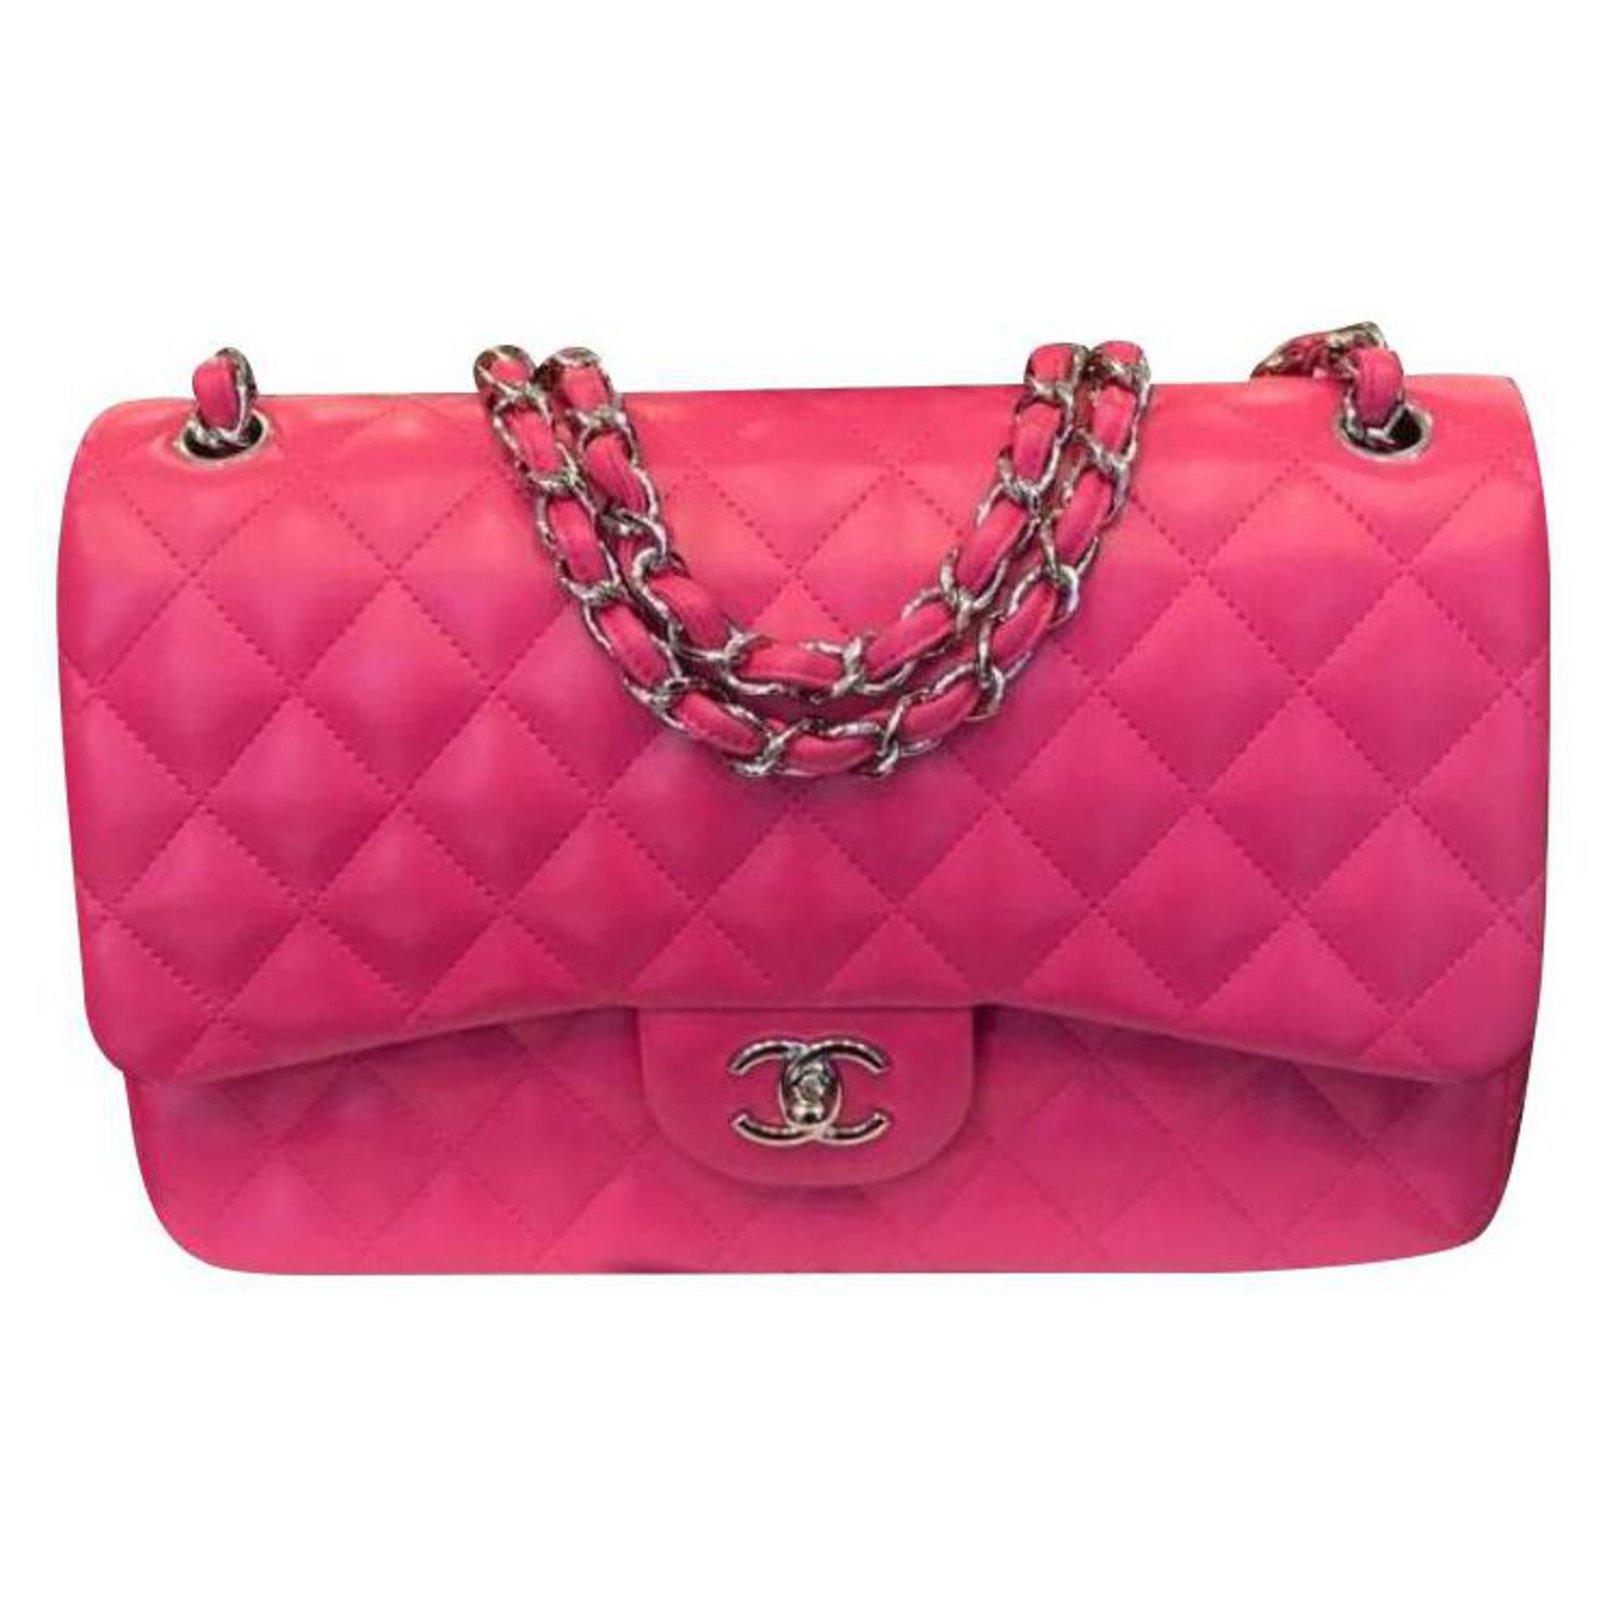 46098f4a8117 Sacs à main Chanel TIMELESS Cuir Rose ref.118123 - Joli Closet